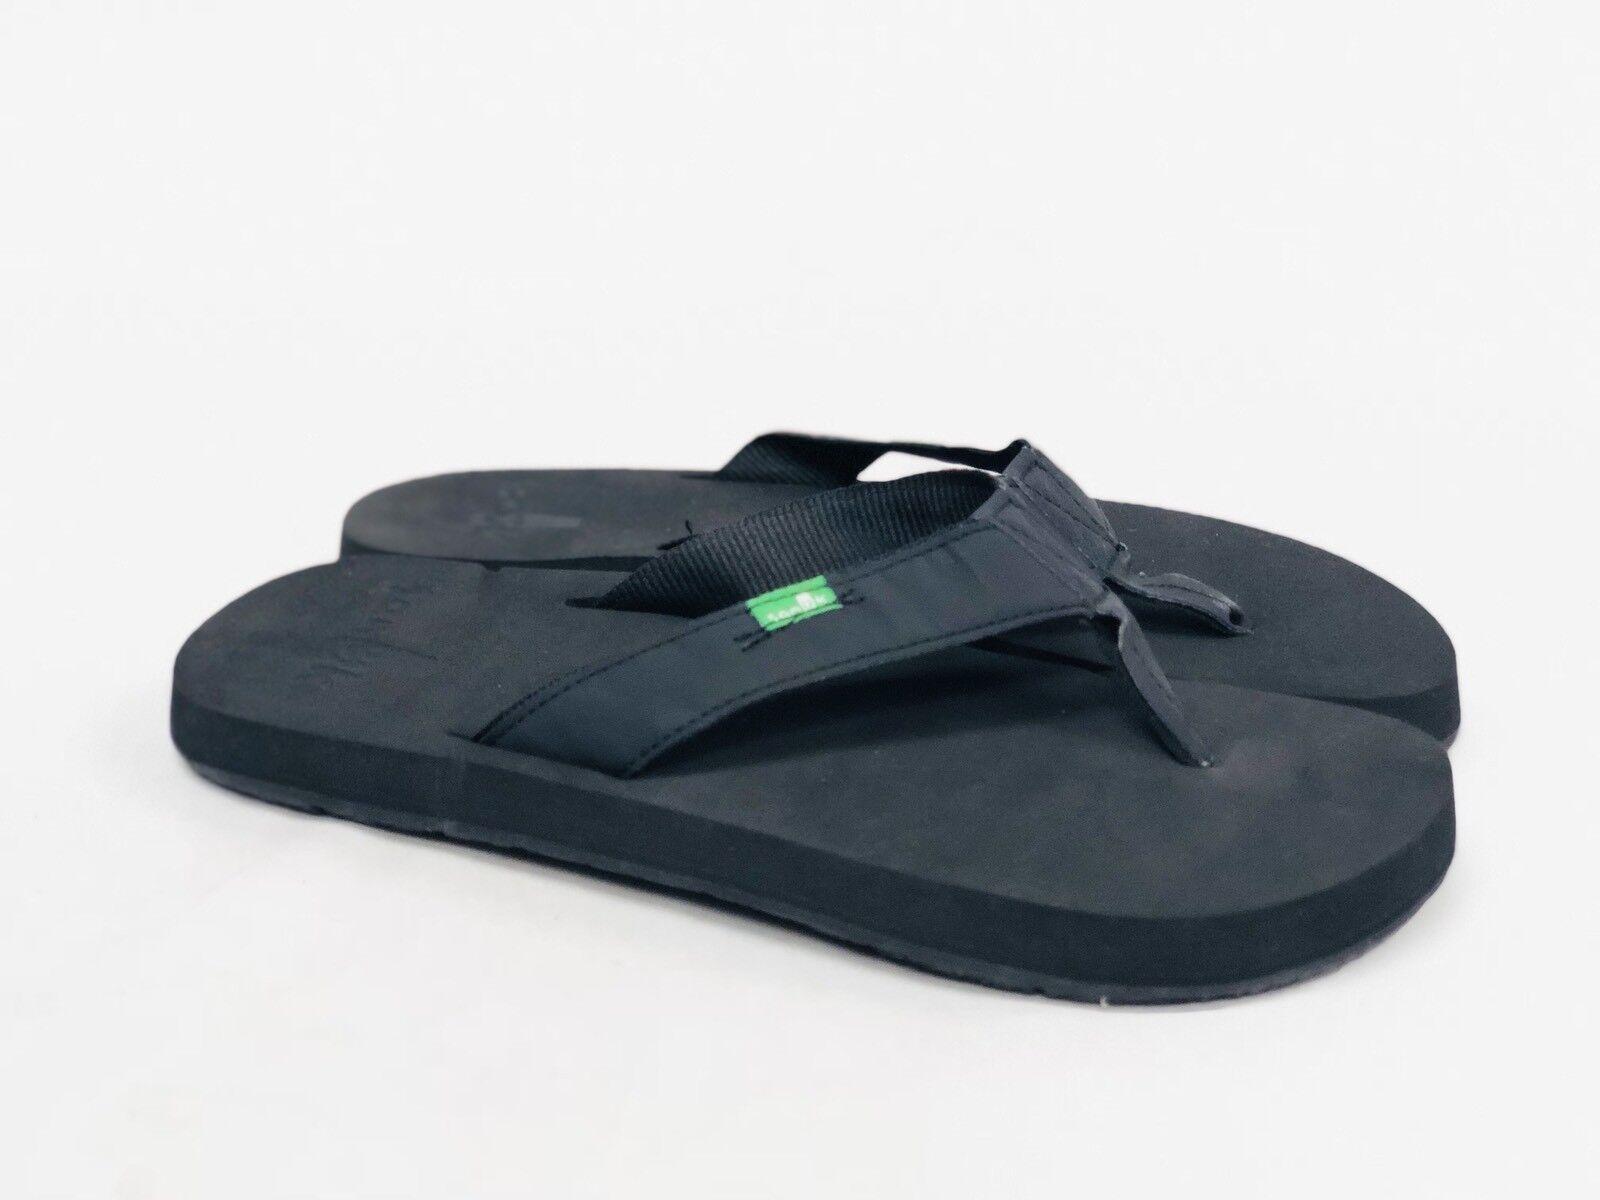 f41e2051cfaa ... Sanuk Men s LONGITUDE BLACKOUT BLACKOUT BLACKOUT Casual Flip Flop Slip  On Sandal SMF10614 YOGA MAT f4711d ...